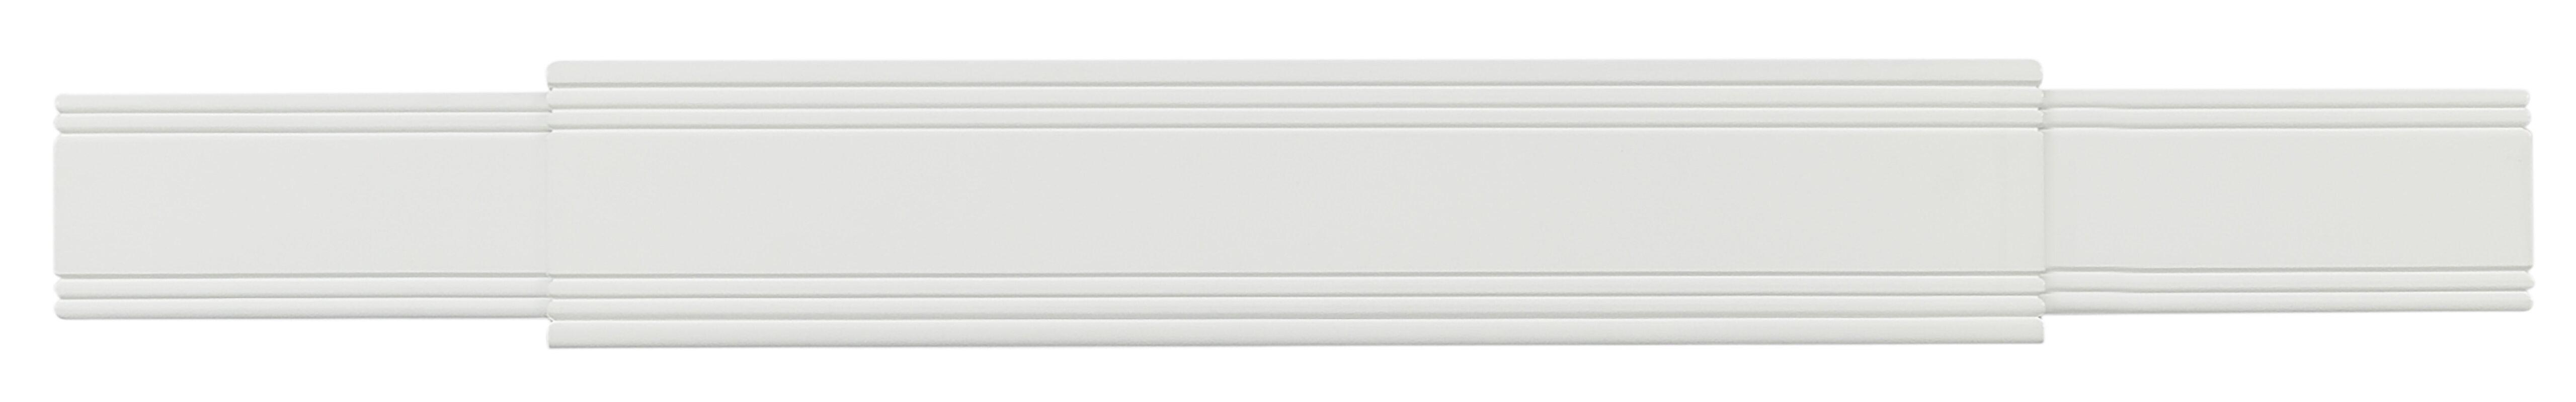 pearl mantels emory adjustable fireplace mantel shelf u0026 reviews